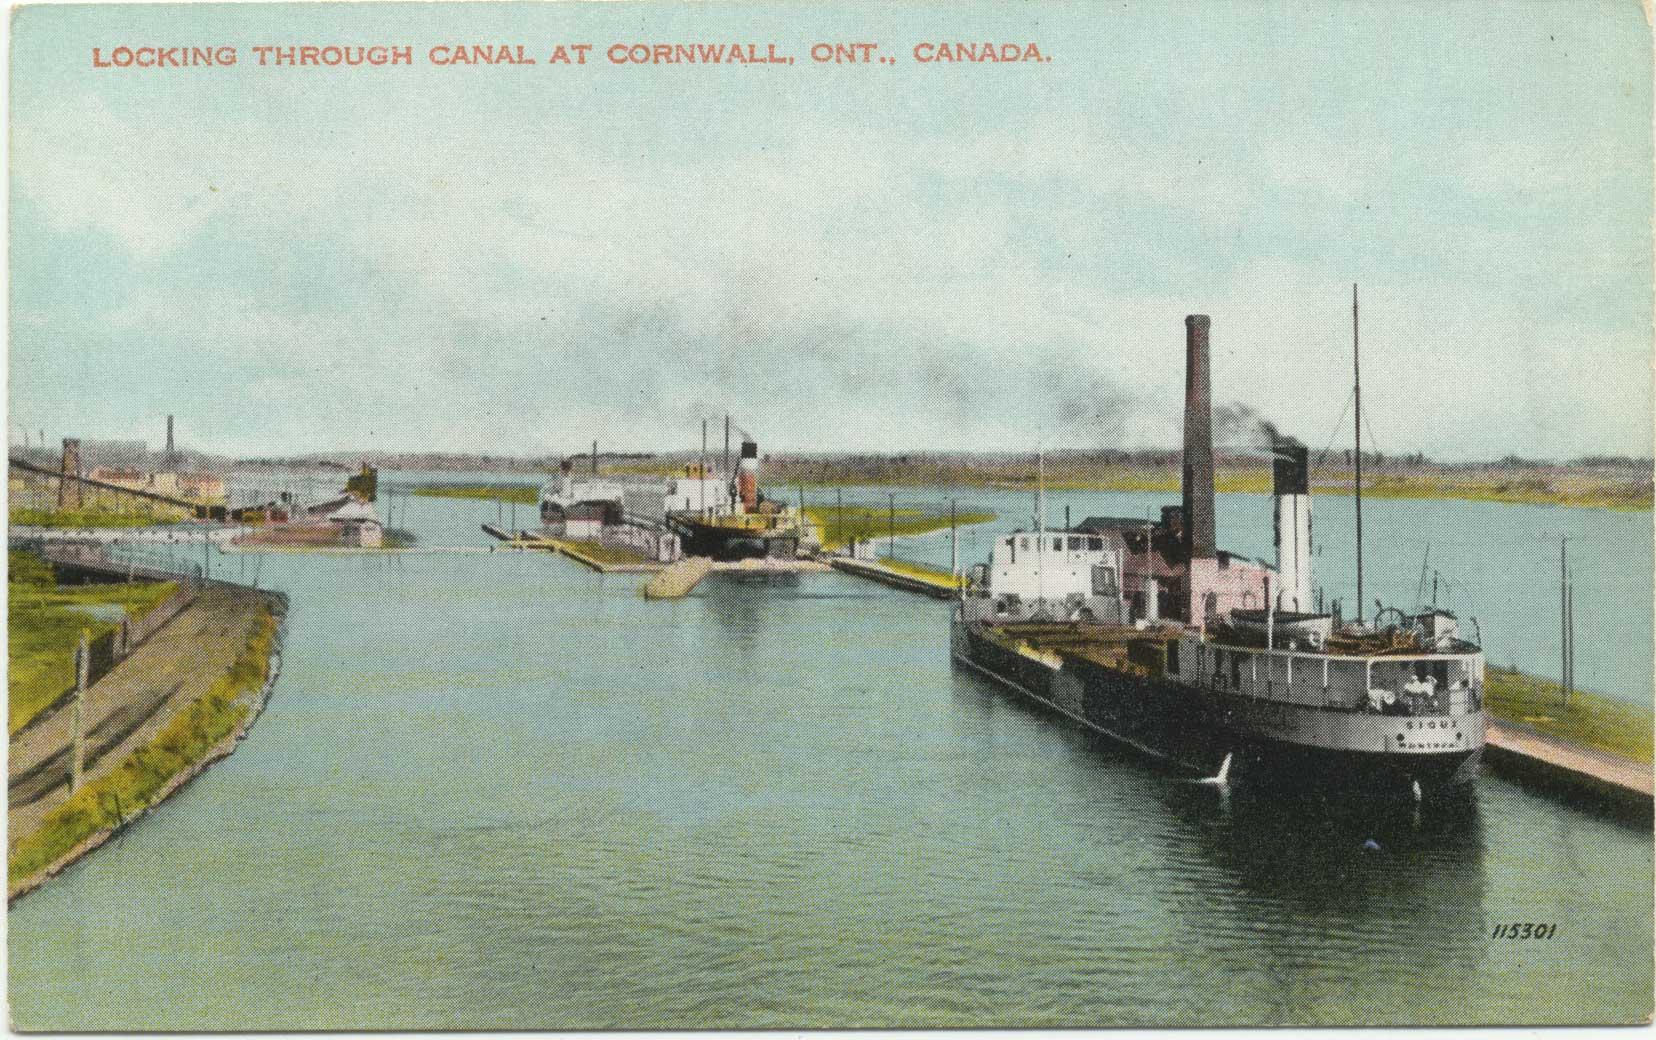 Locking through Canal at Cornwall, Ont., Canada